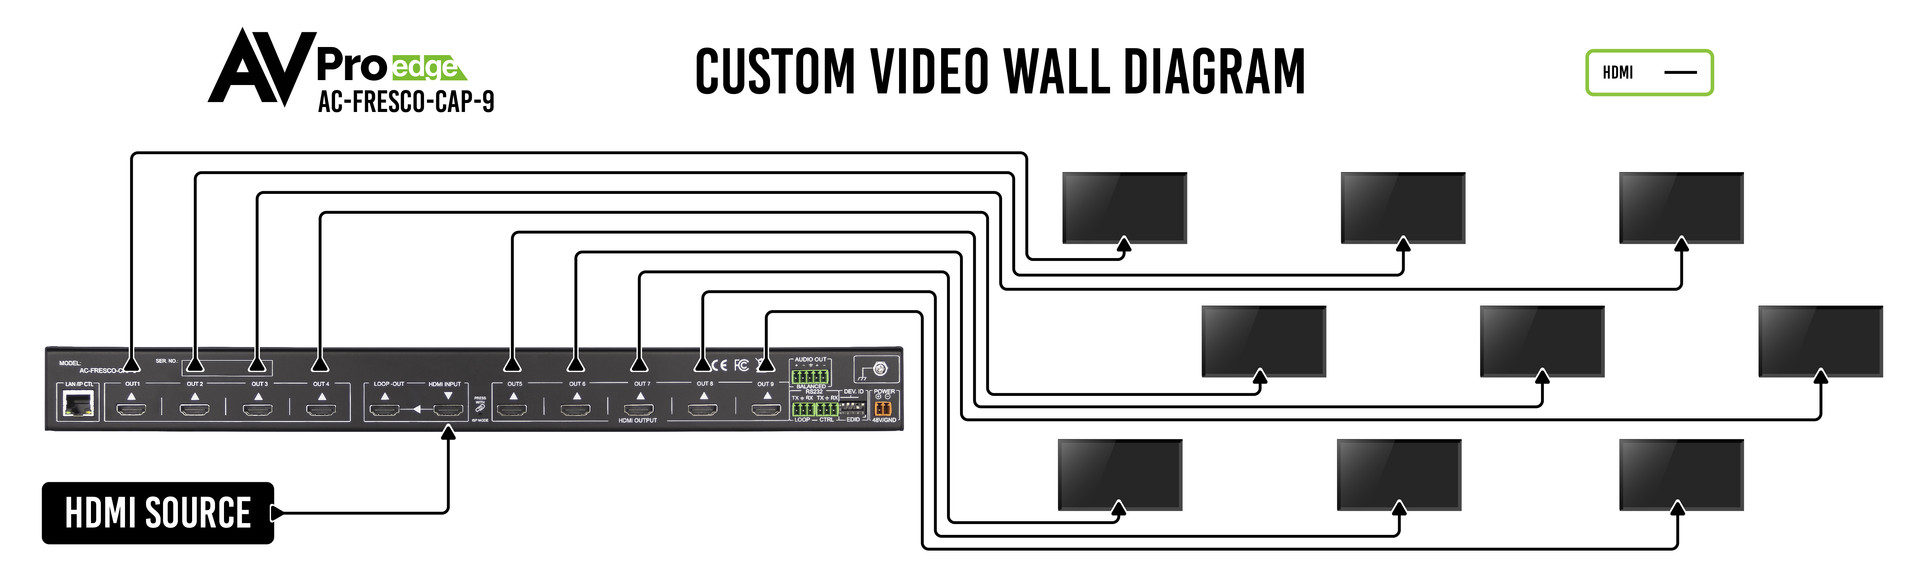 AC-FRESCO-CAP-9 Custom Video Wall Diagra